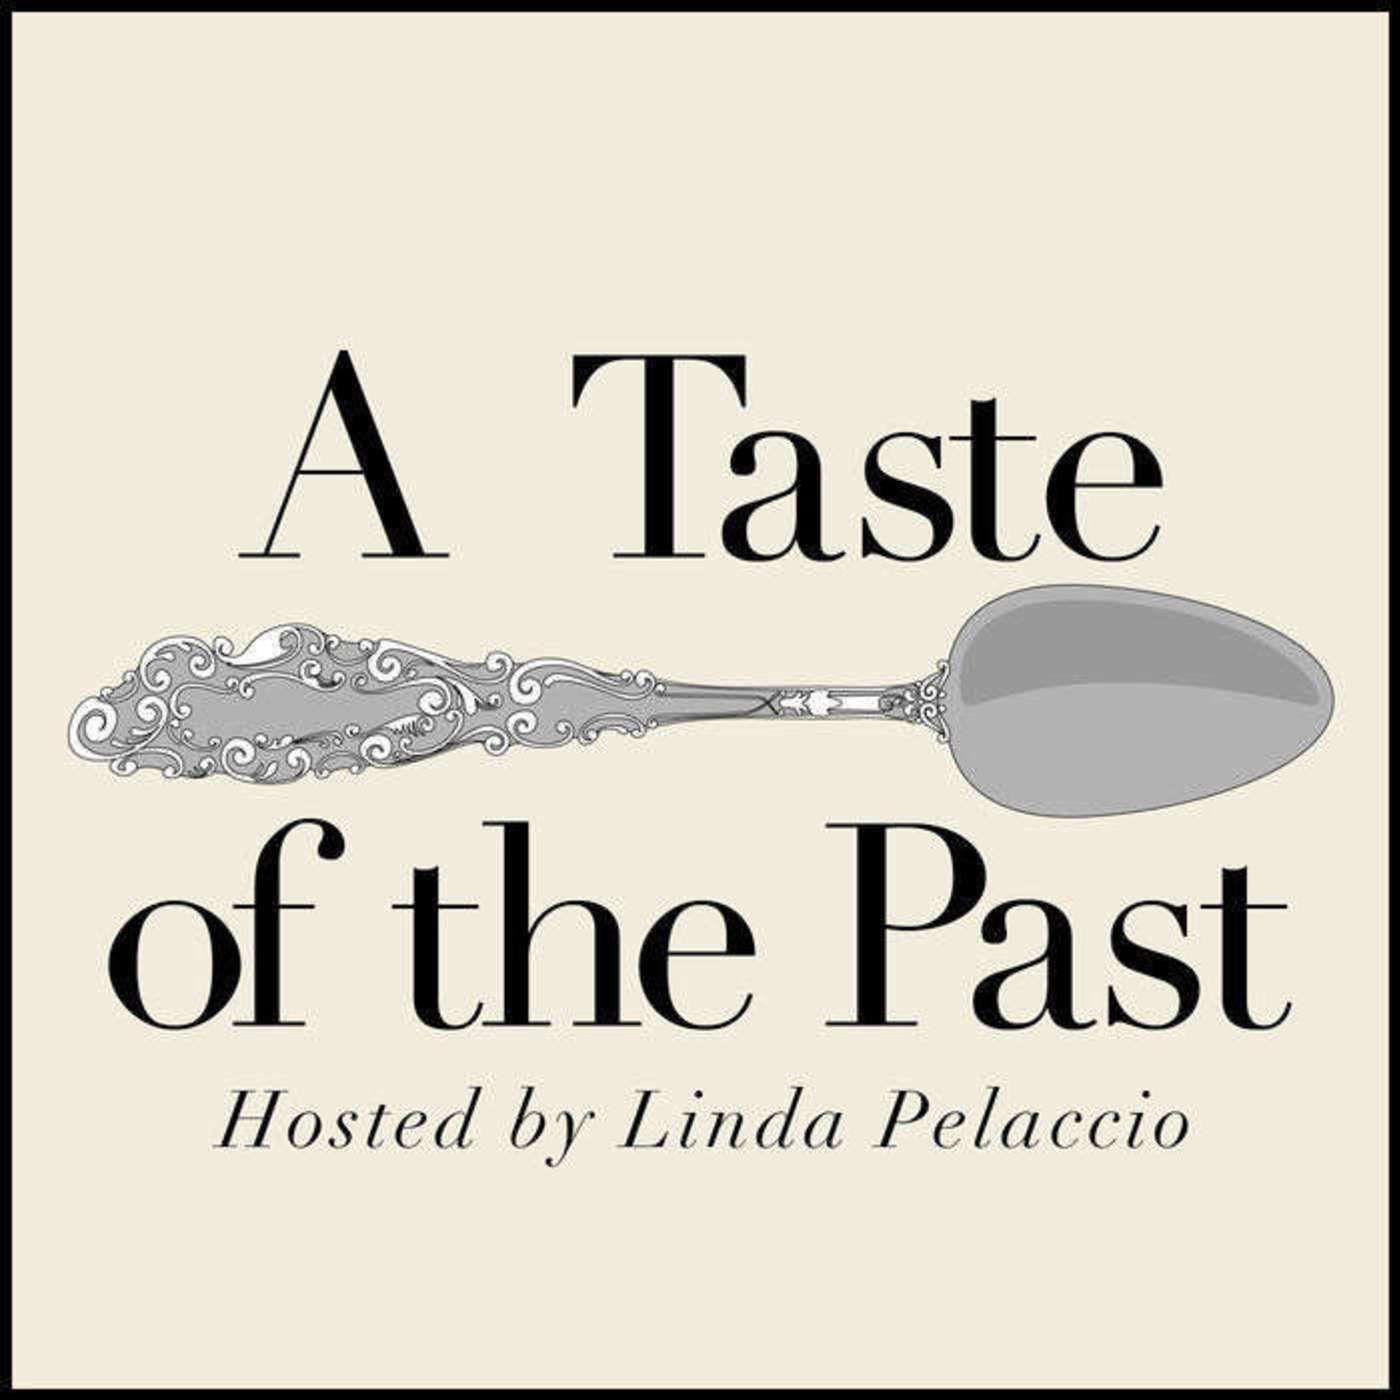 Episode 18: Rice with Renee Marton